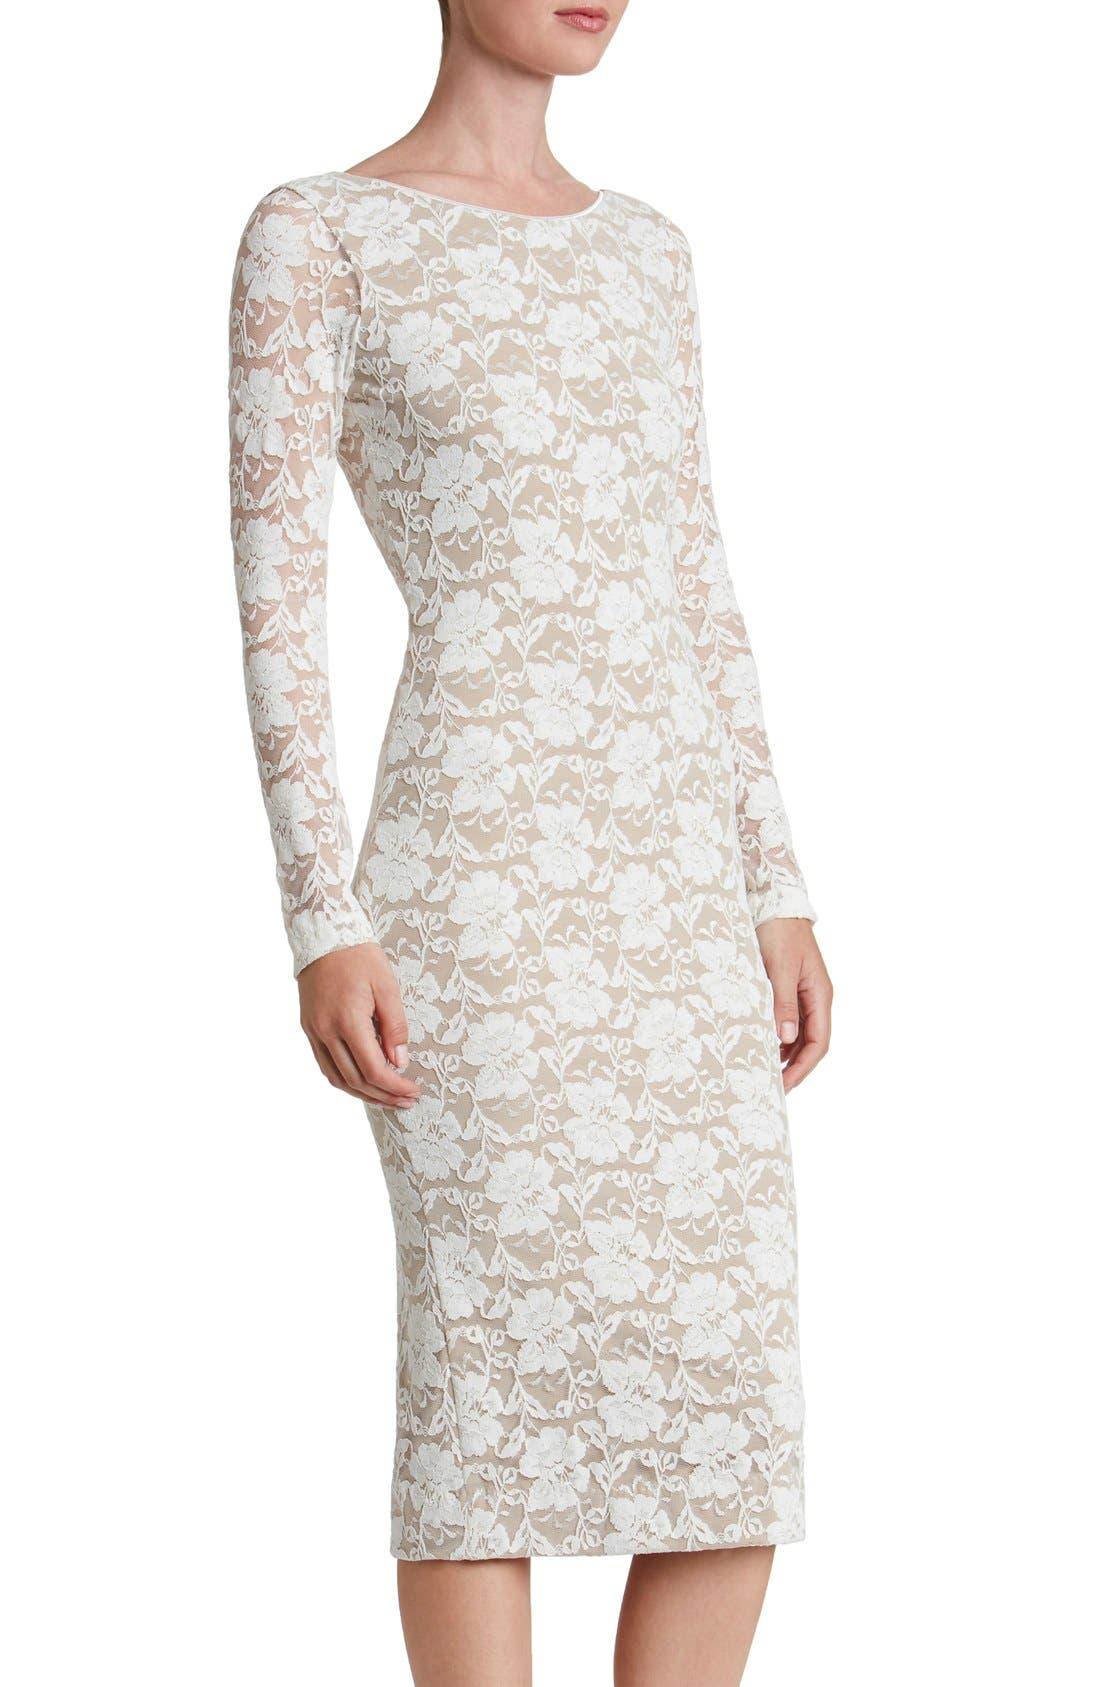 Emery Lace Body-Con Midi Dress,                         Main,                         color, Ivory/ Nude